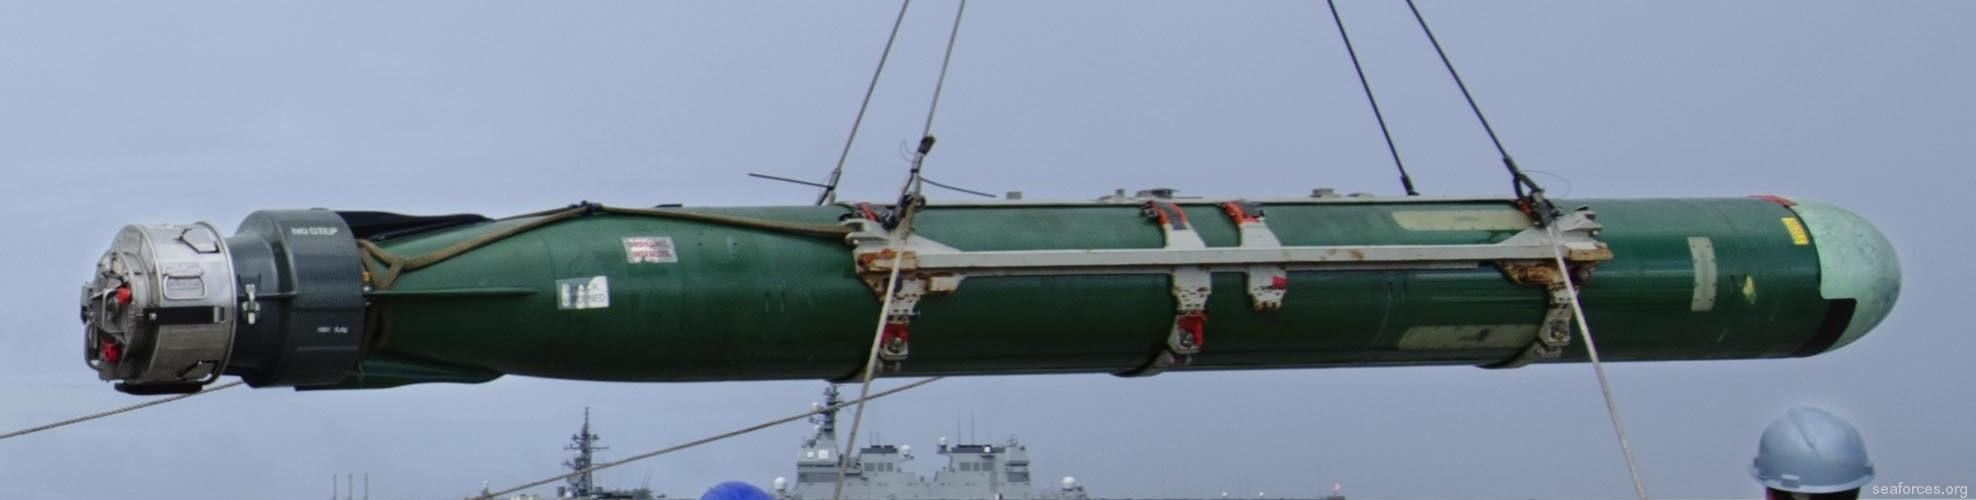 "Mk-48 ADCAP Torpedo 533mm 21"" inches heavy weight Submarine SSN"